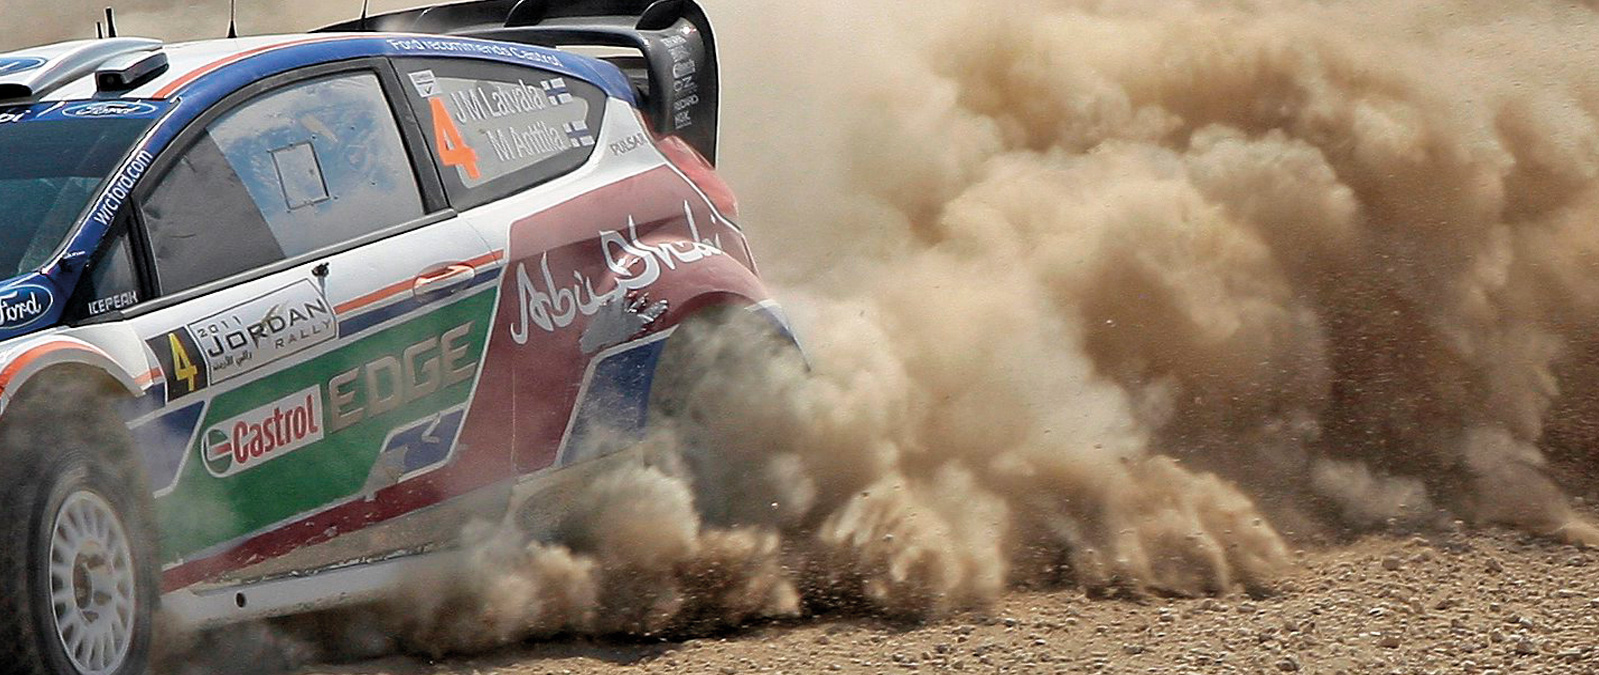 Jordan Rally - A brand driven experience